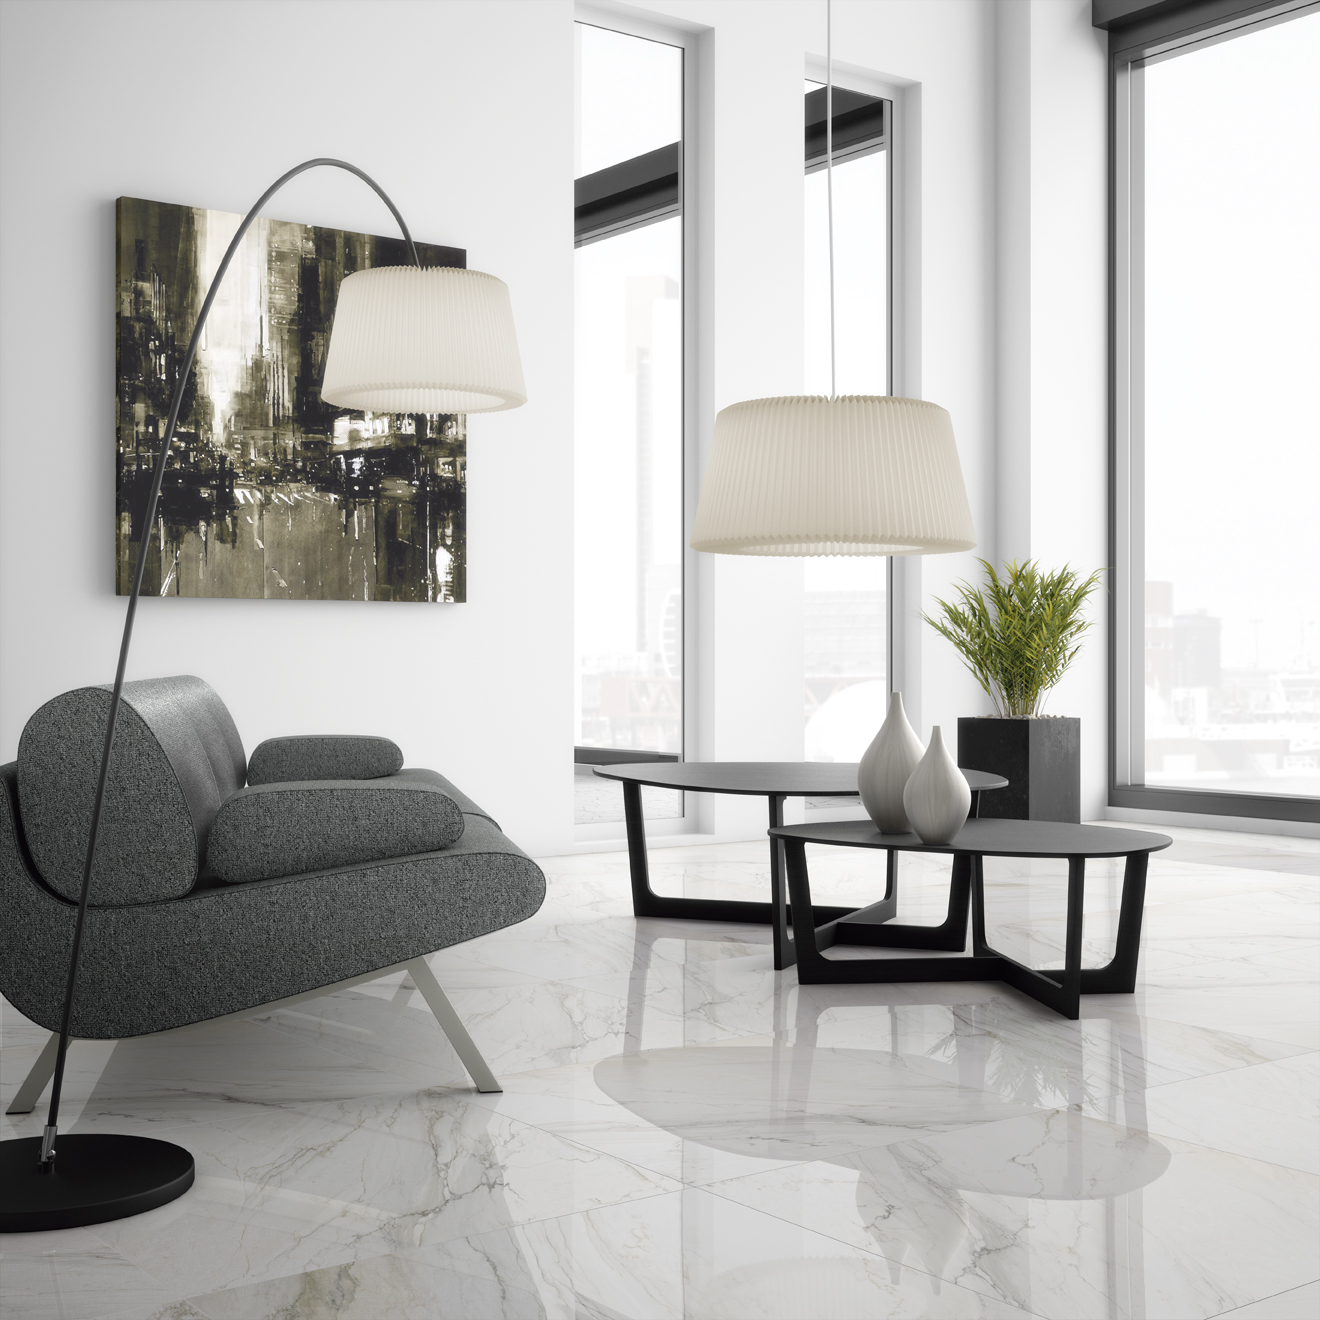 Touche Super Blanco-Crema High-gloss Polished_2.jpg